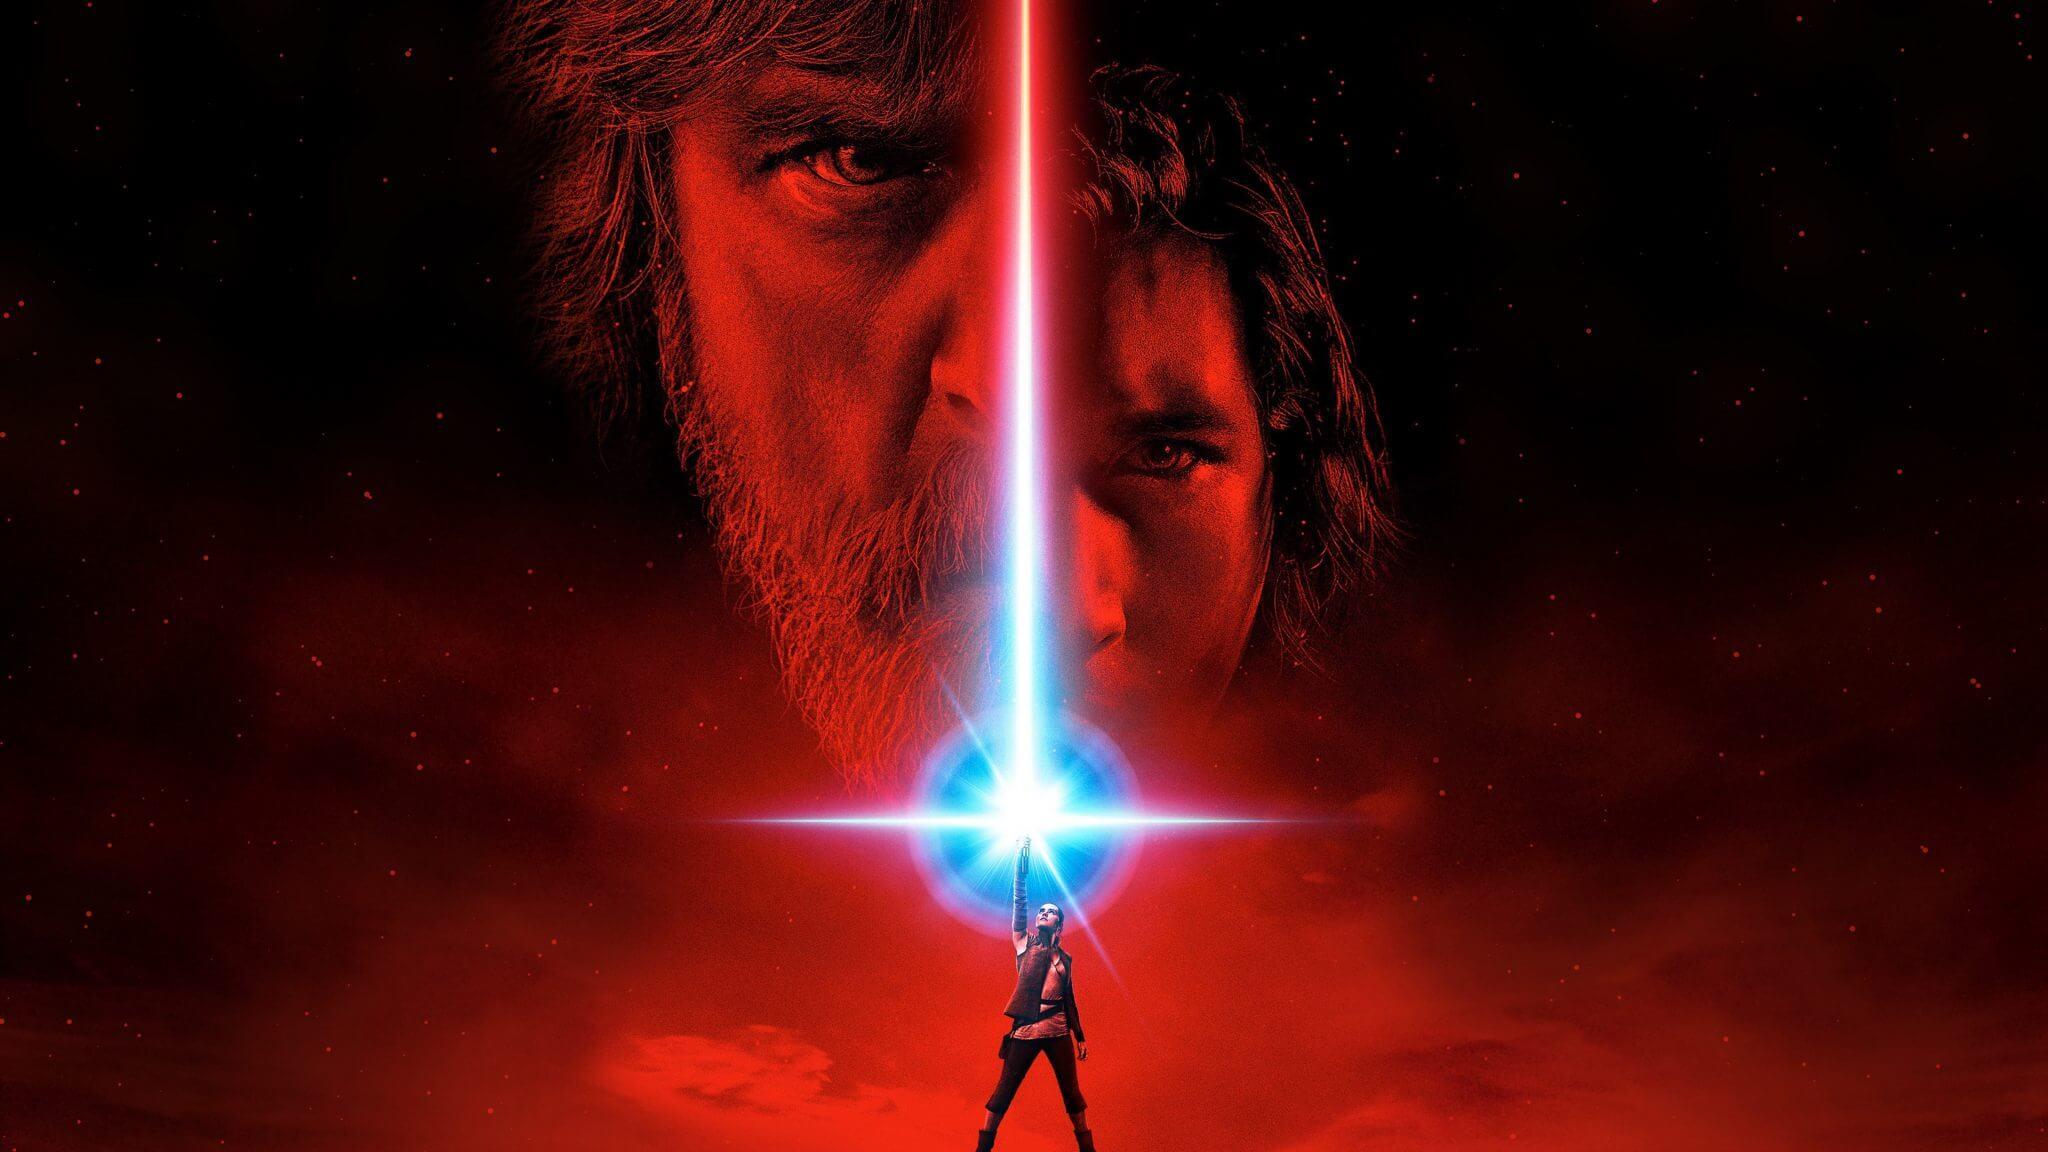 thelastjedi 3 - Saiu! Assista ao primeiro teaser-trailer de Star Wars: Os Últimos Jedi